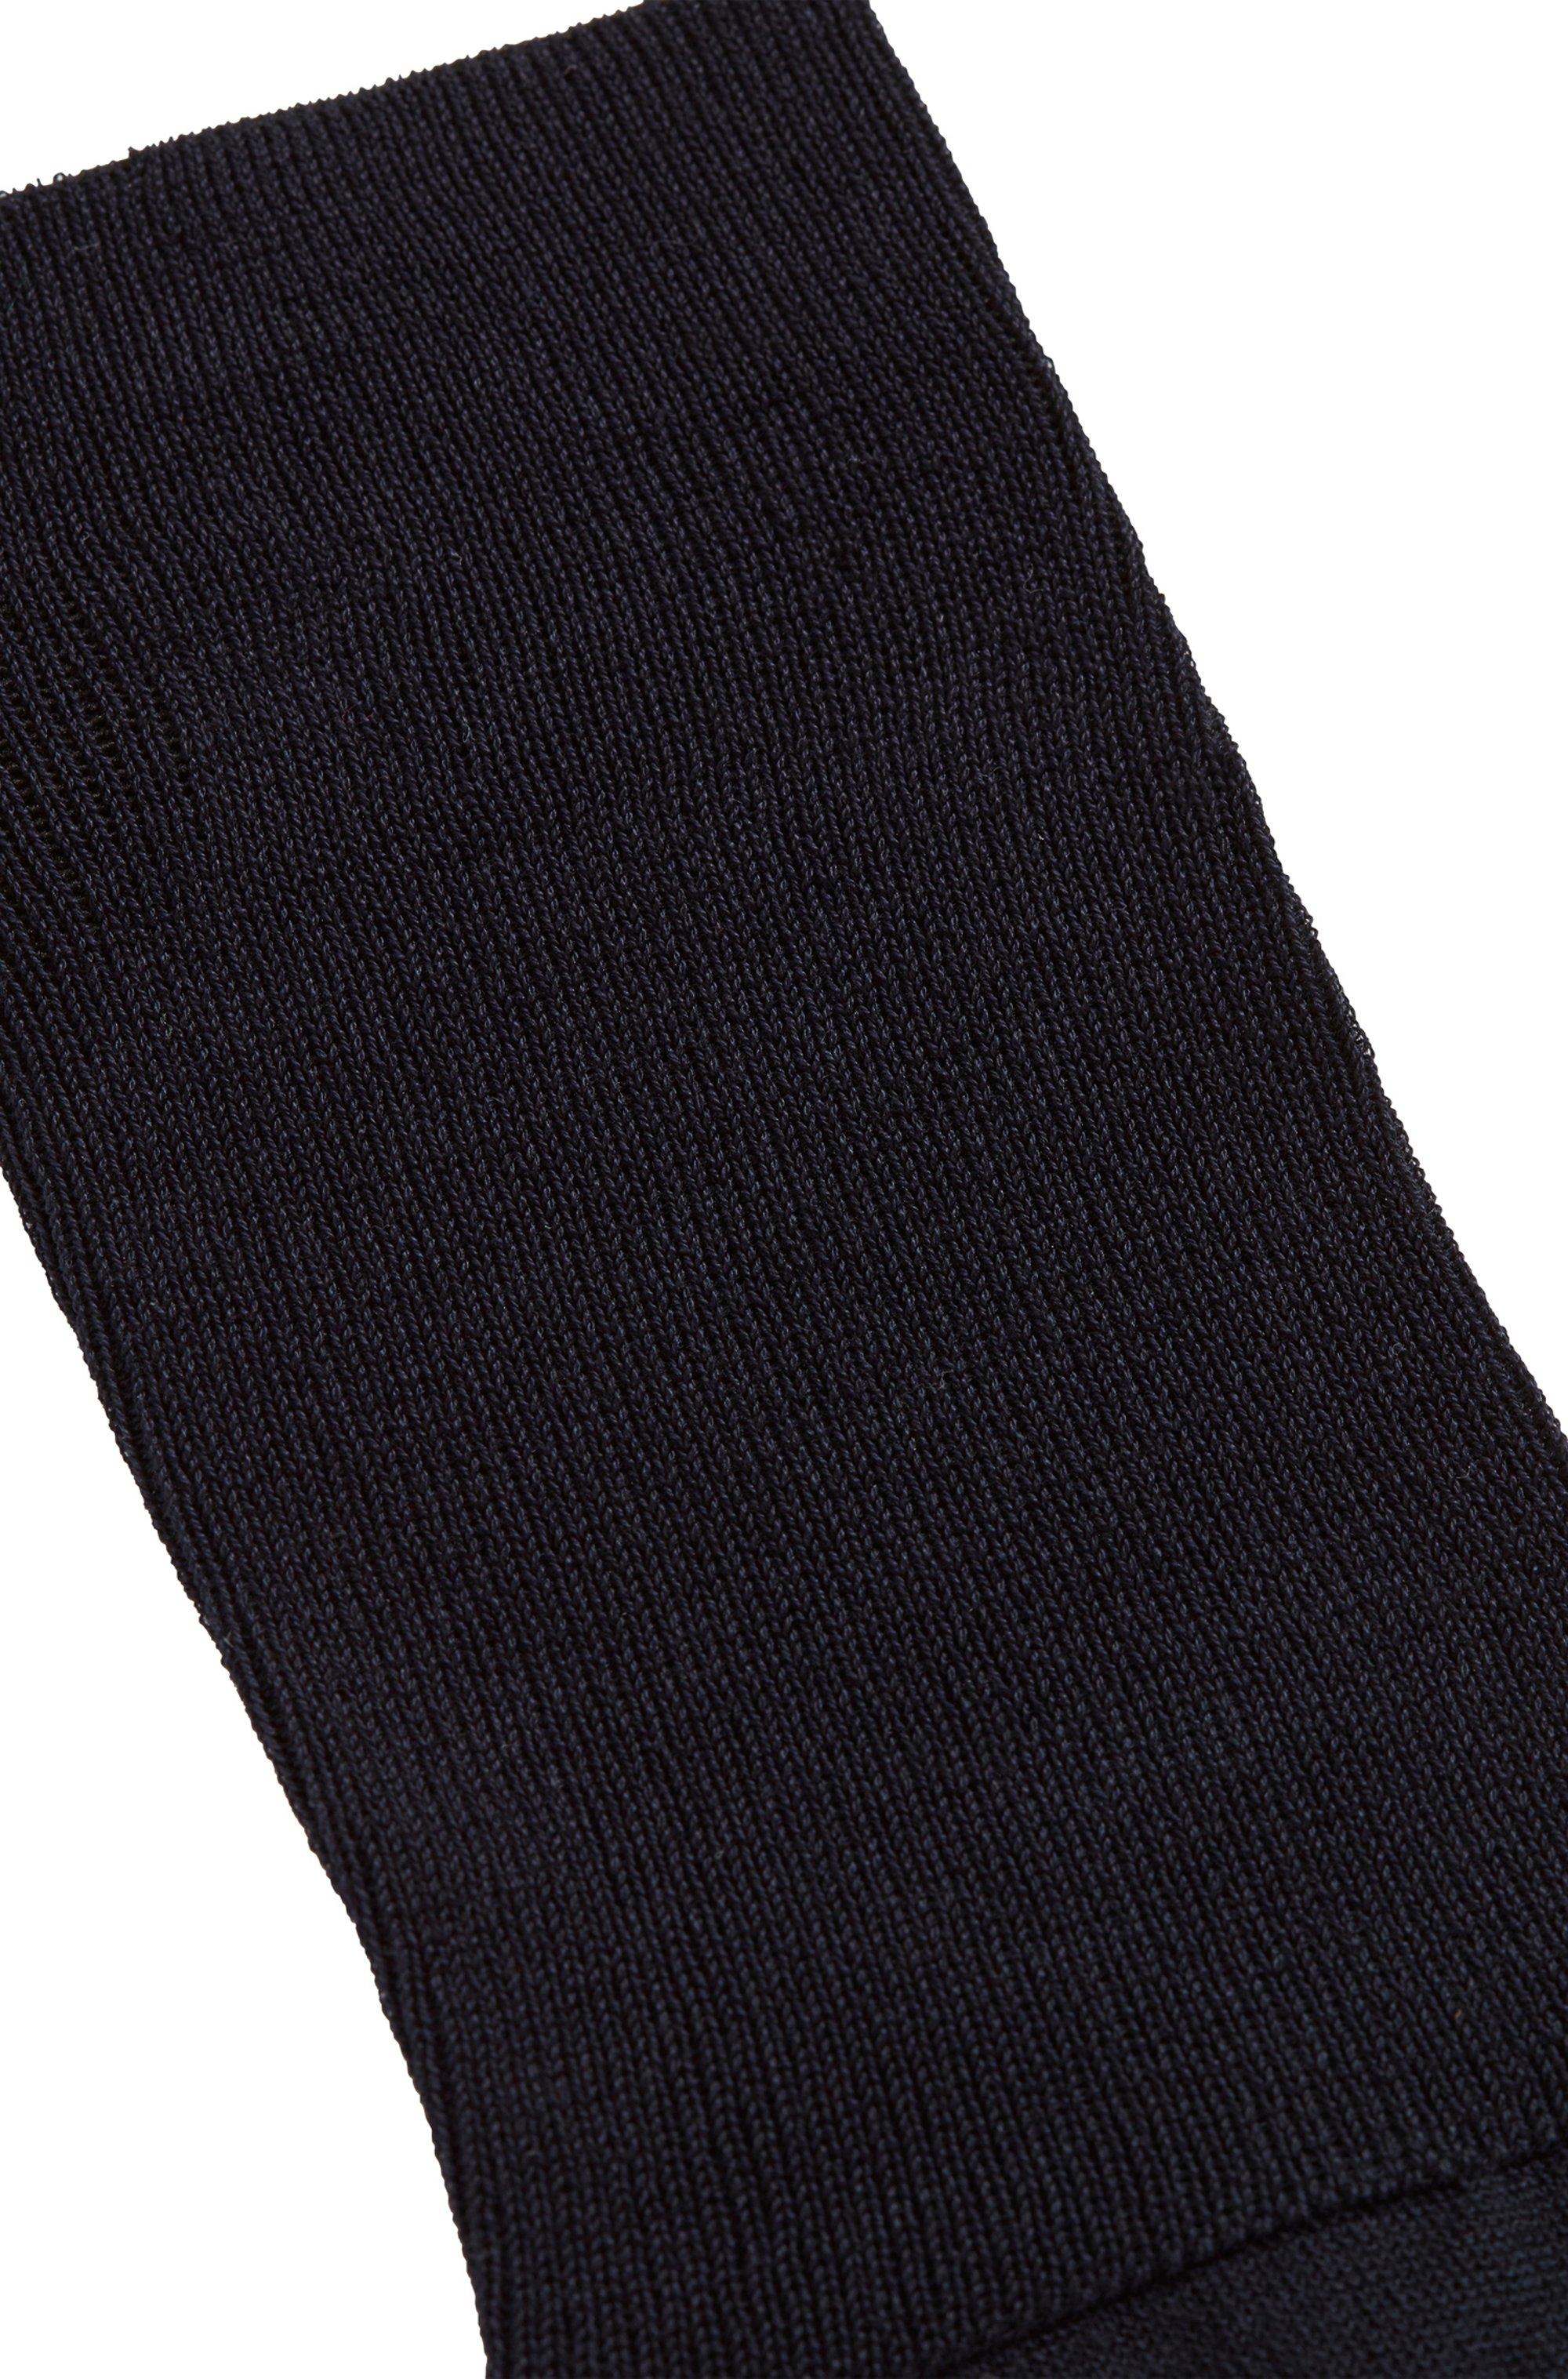 Knee-length socks in mercerised Egyptian stretch cotton